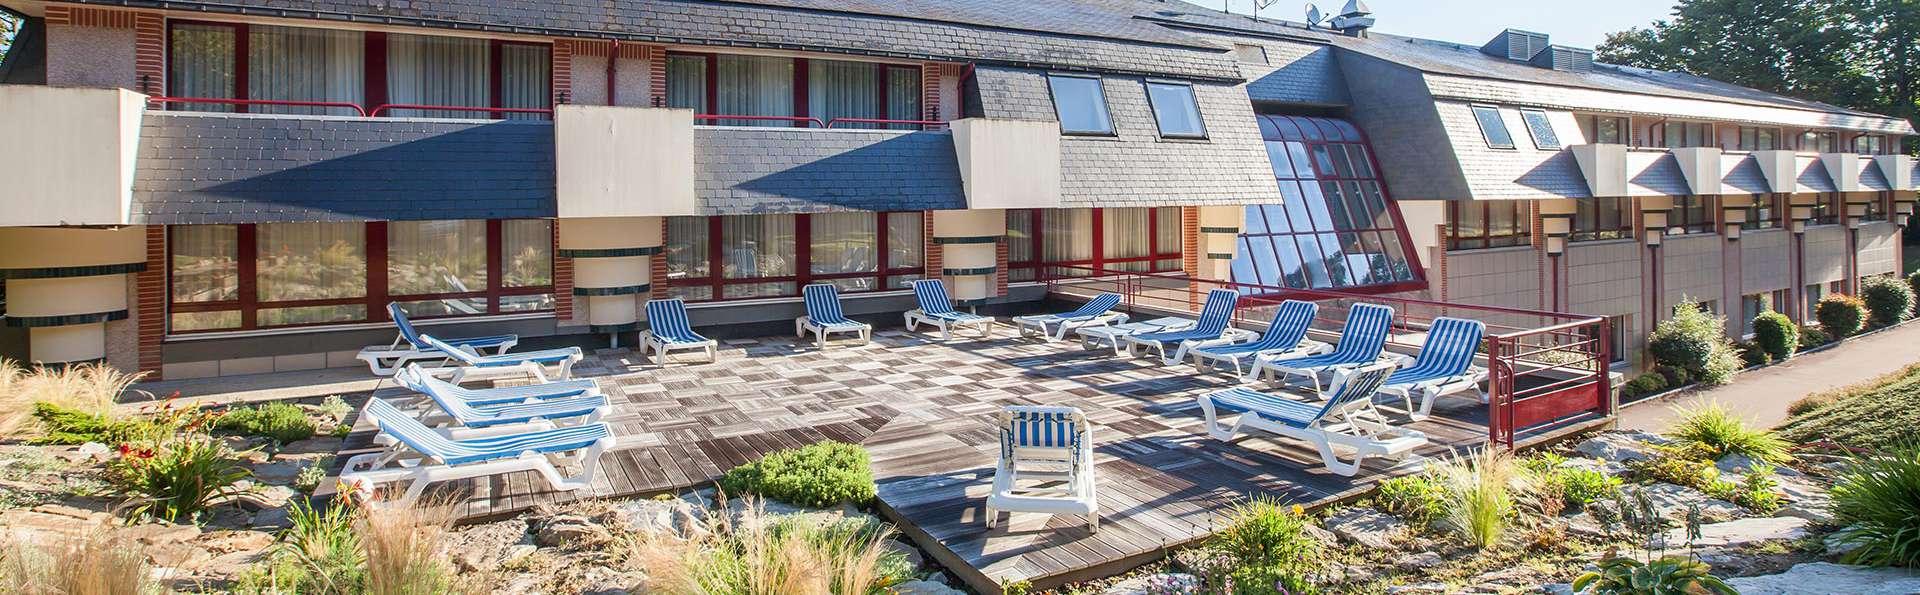 Hotel Spa Du Beryl Bagnoles De L Orne Avis